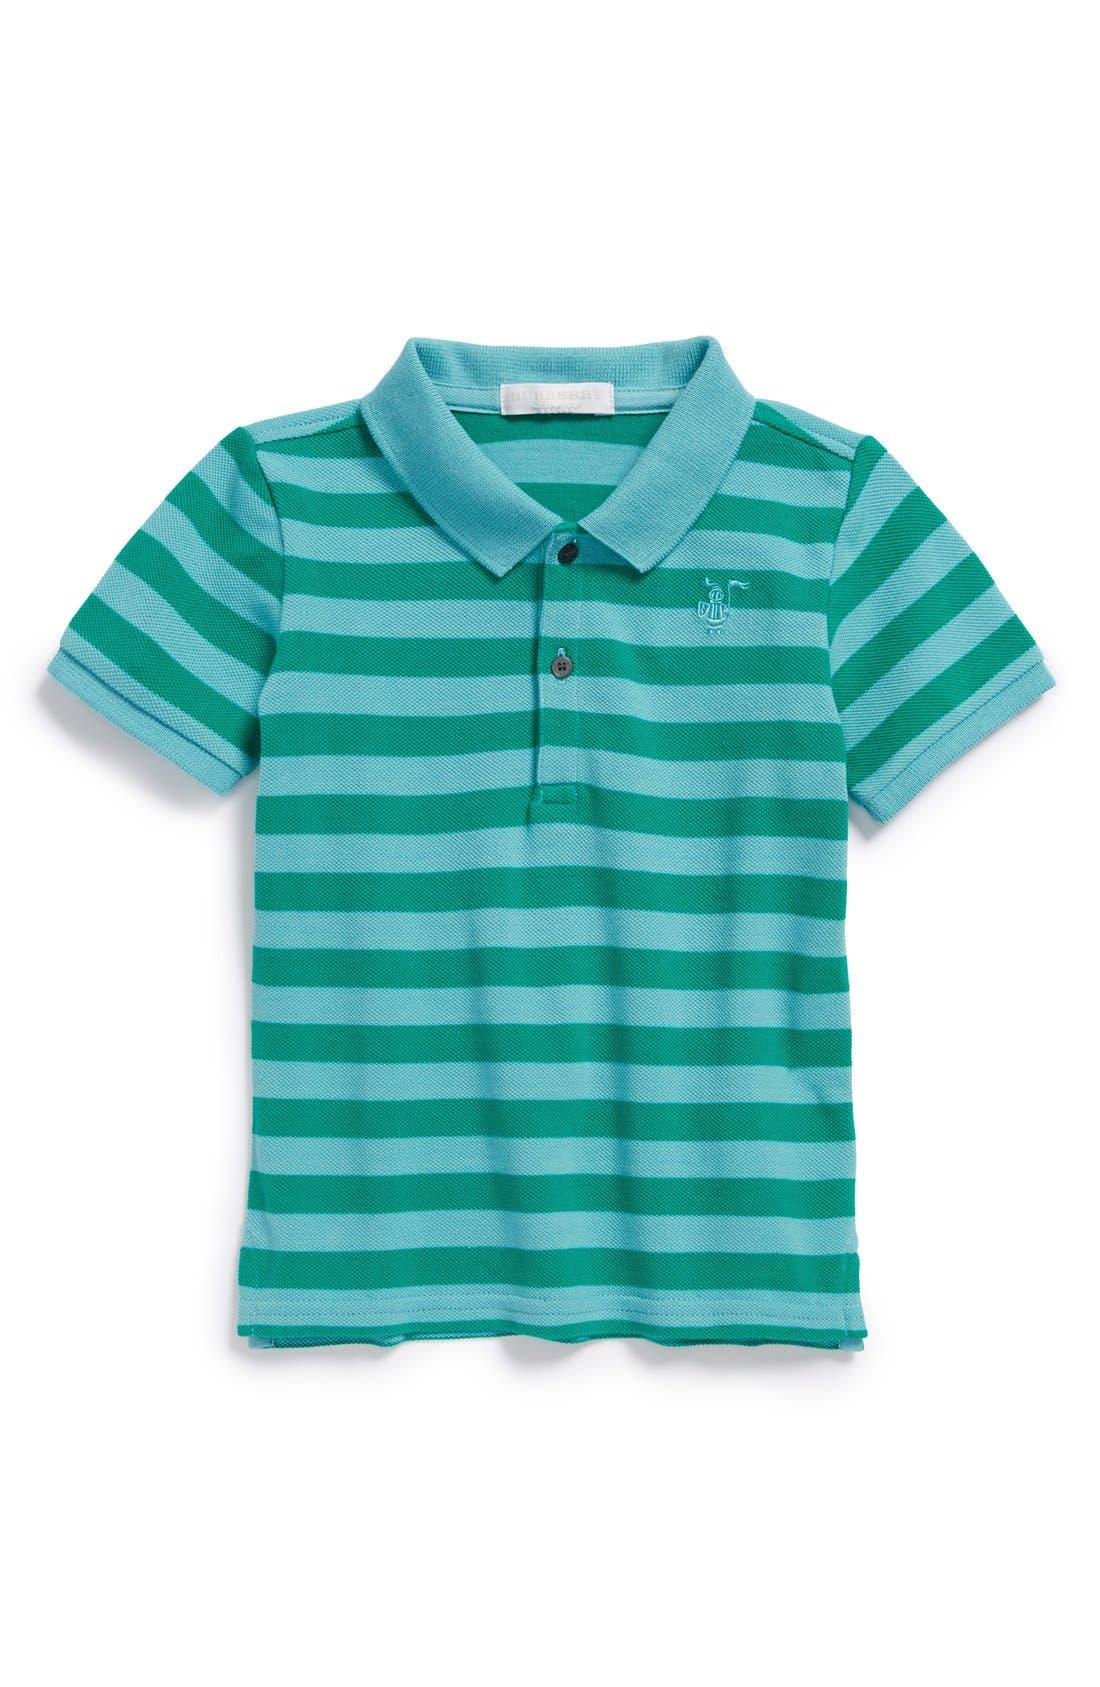 Alternate Image 1 Selected - Burberry Stripe Polo (Toddler Boys)